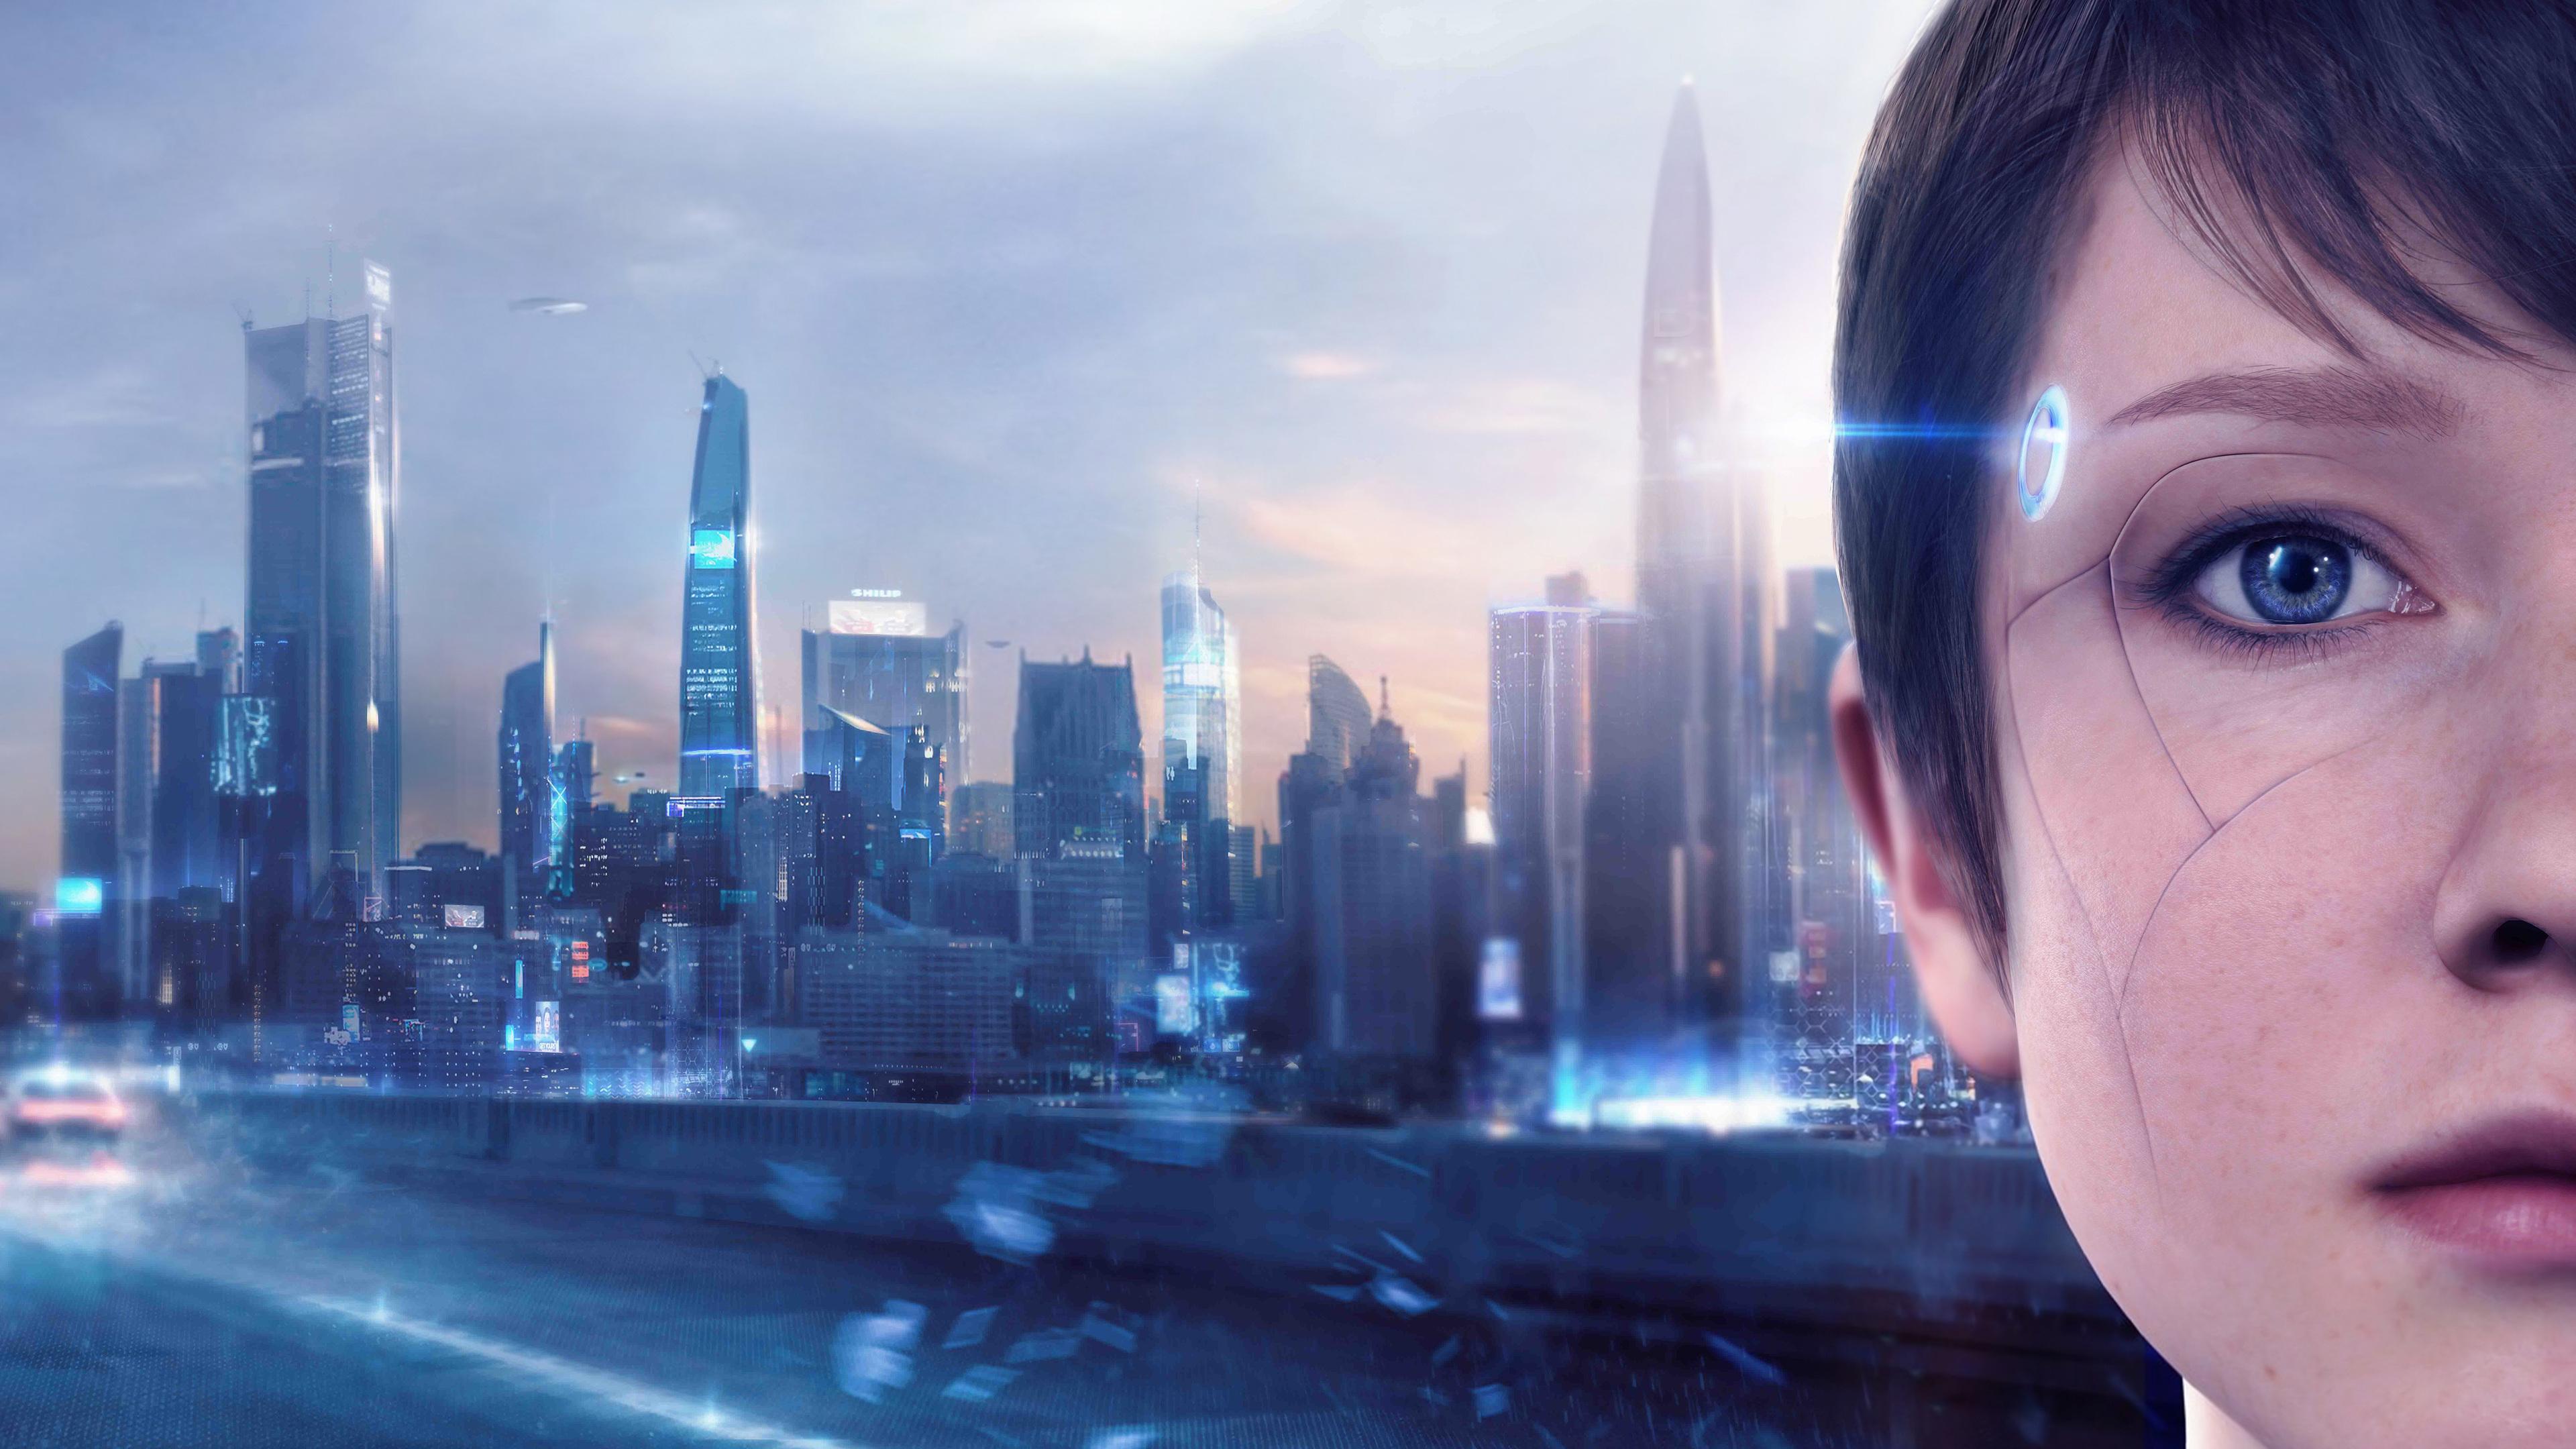 Wallpaper 4k Detroit Become Human 5k 2018 Games Wallpapers 4k